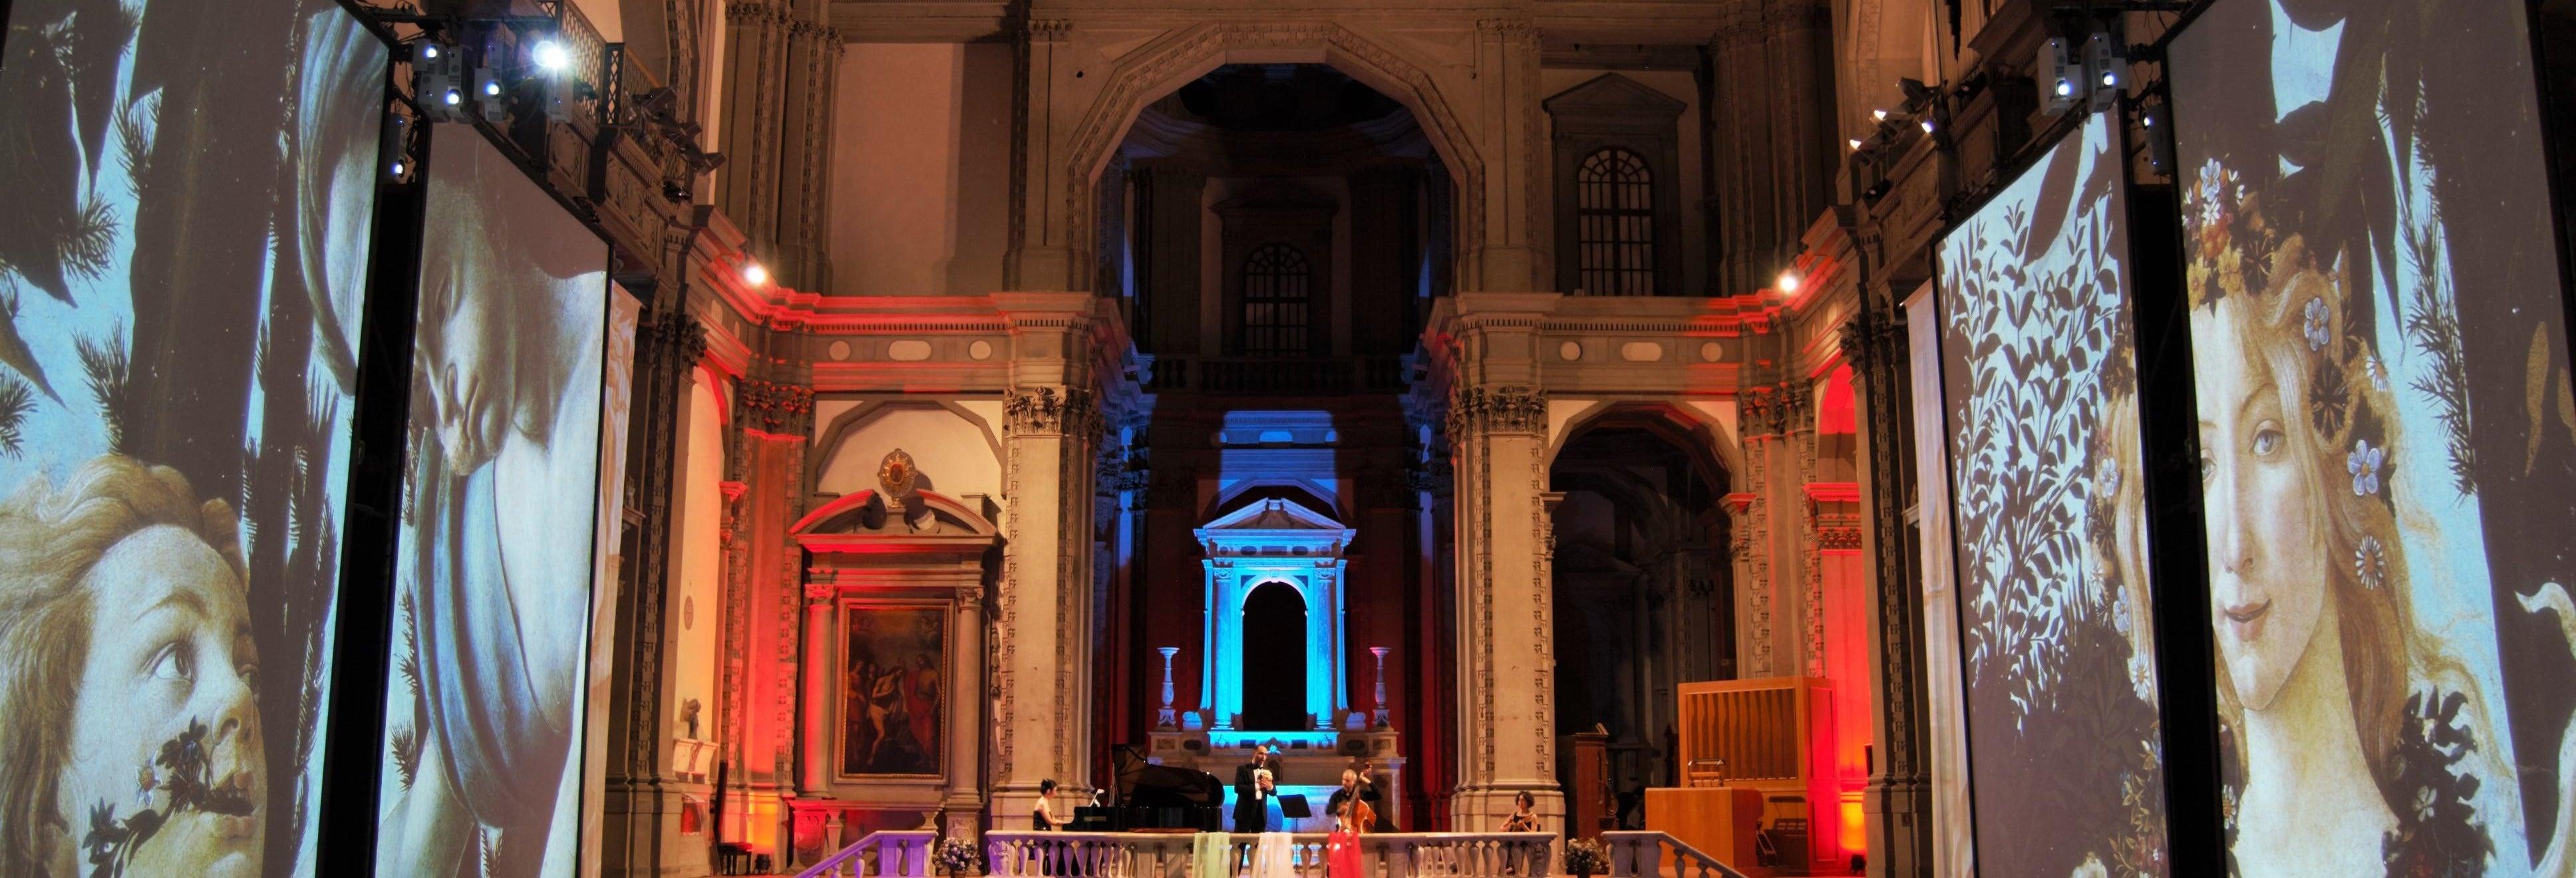 Ópera em Santo Stefano al Ponte Vecchio